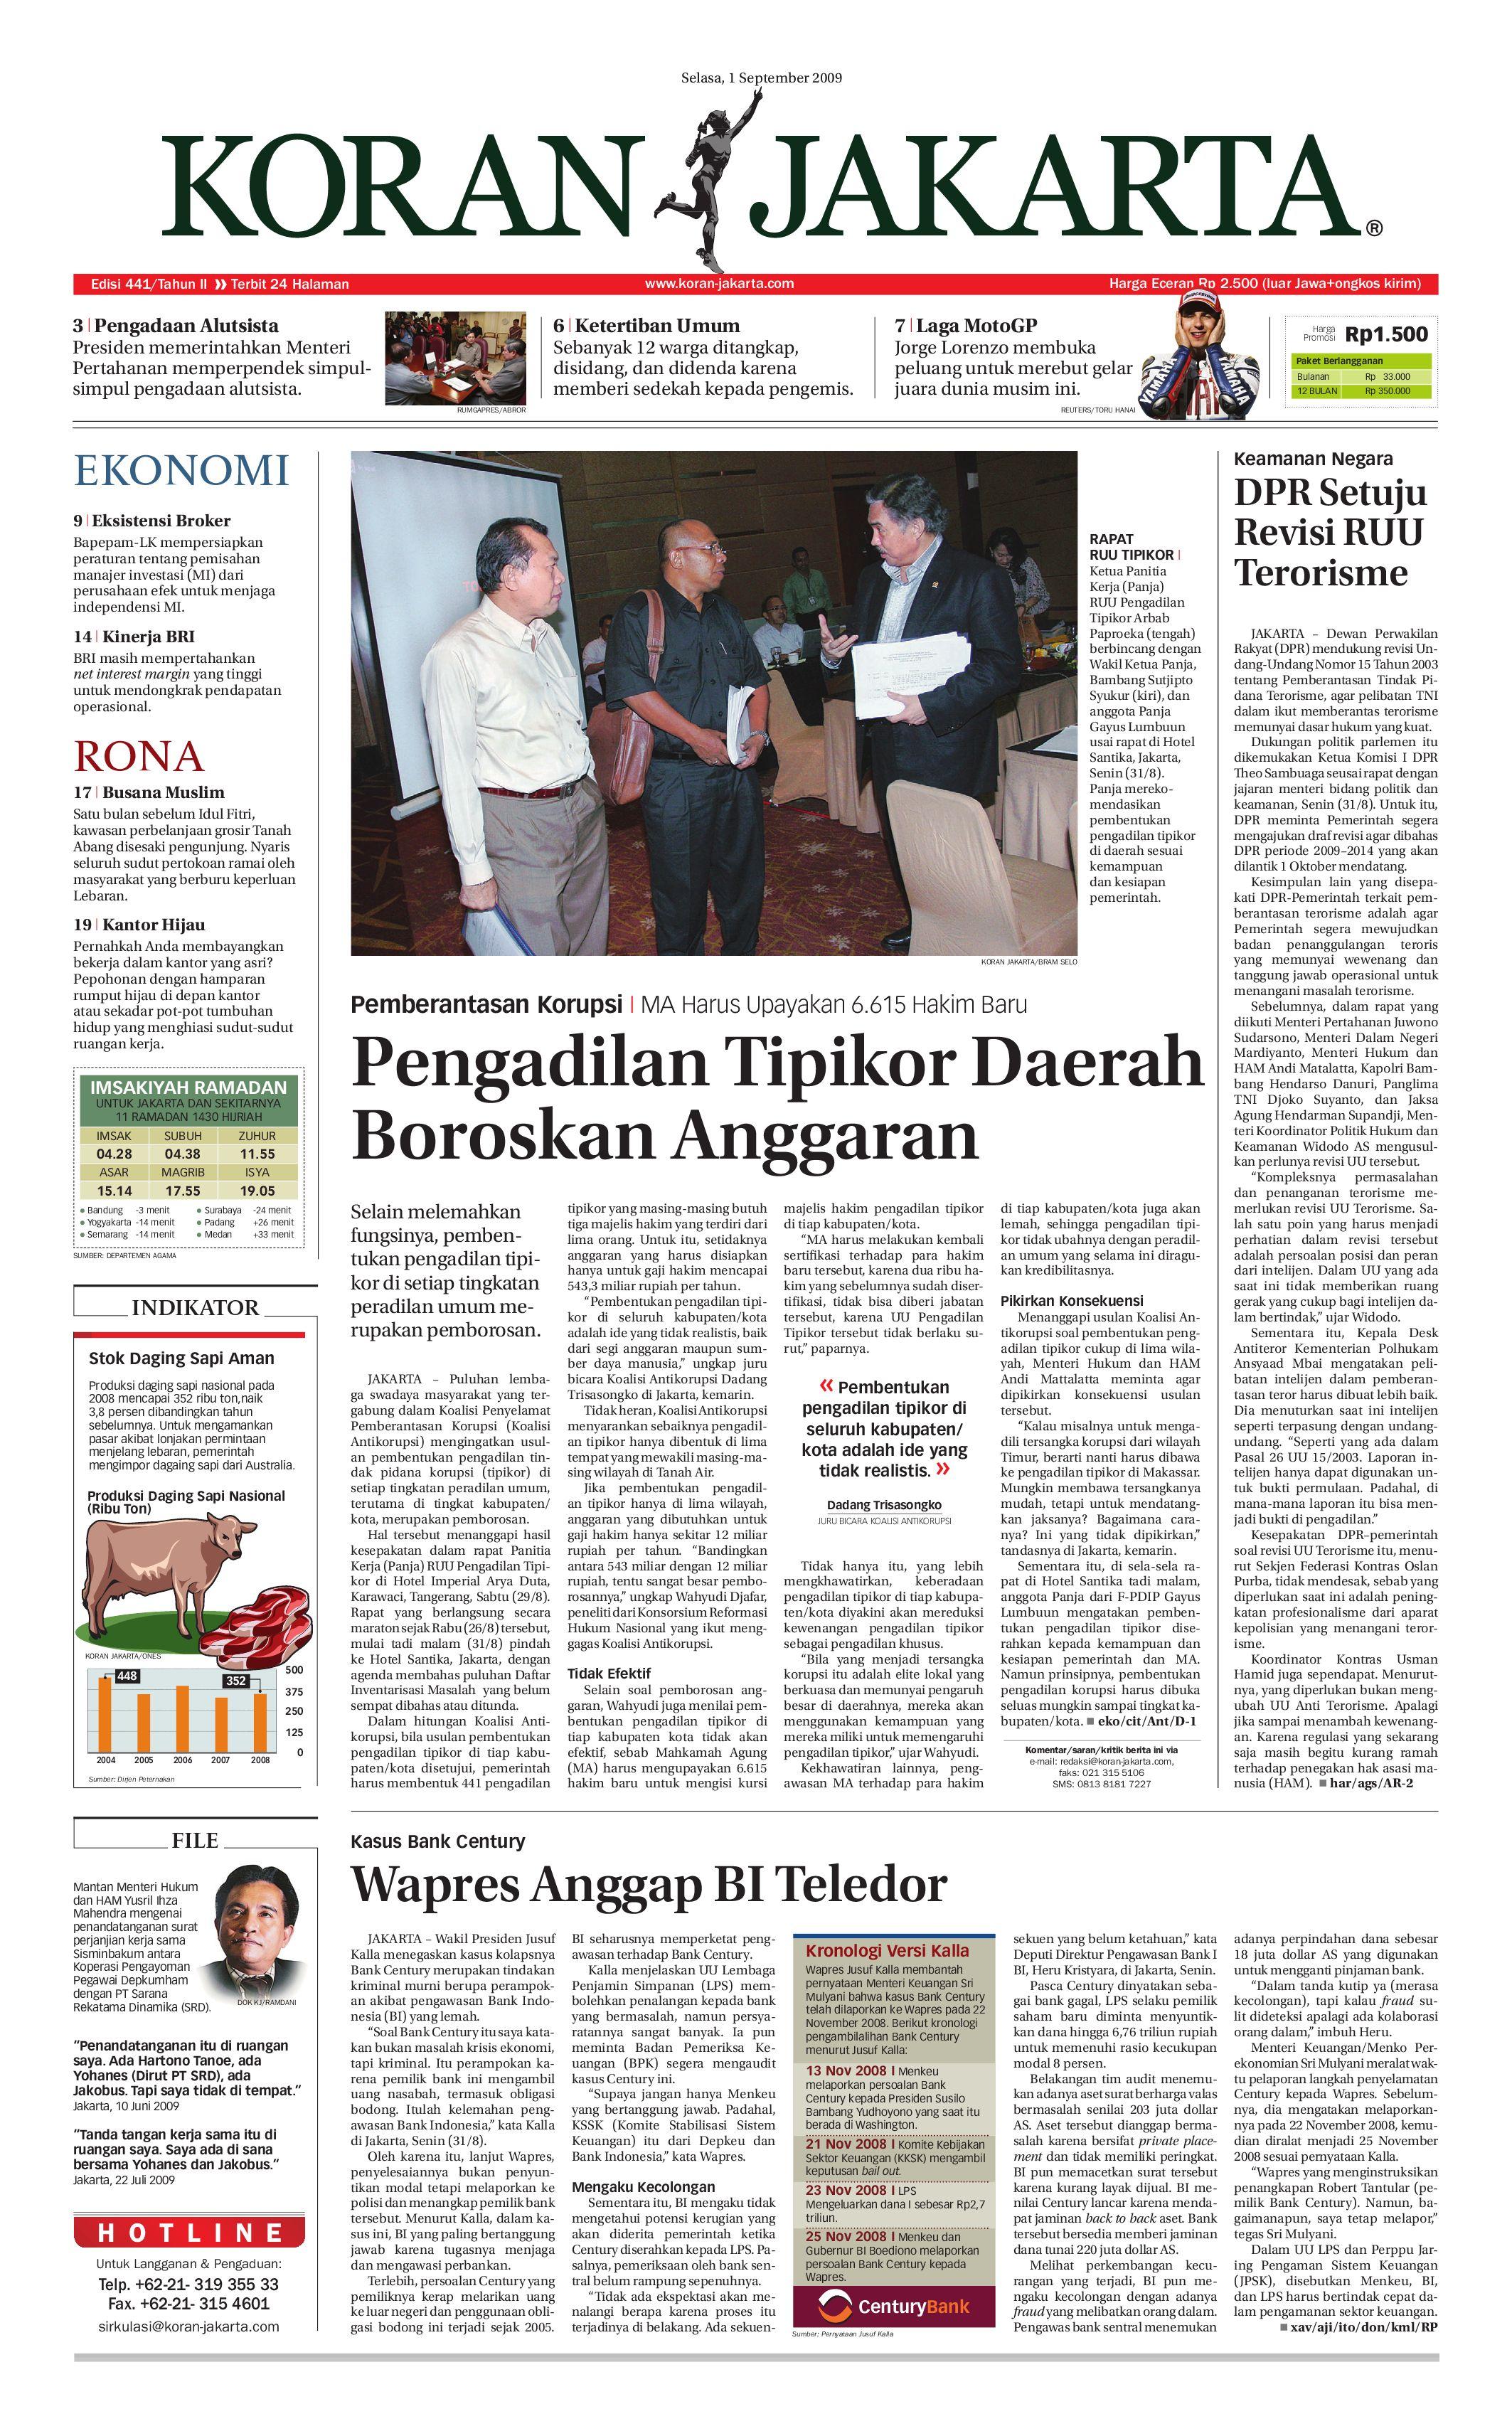 Edisi 441 01 September 2009 By Pt Berita Nusantara Issuu Bri Produk Ukm Bumn Kain Doby Motif Bunga